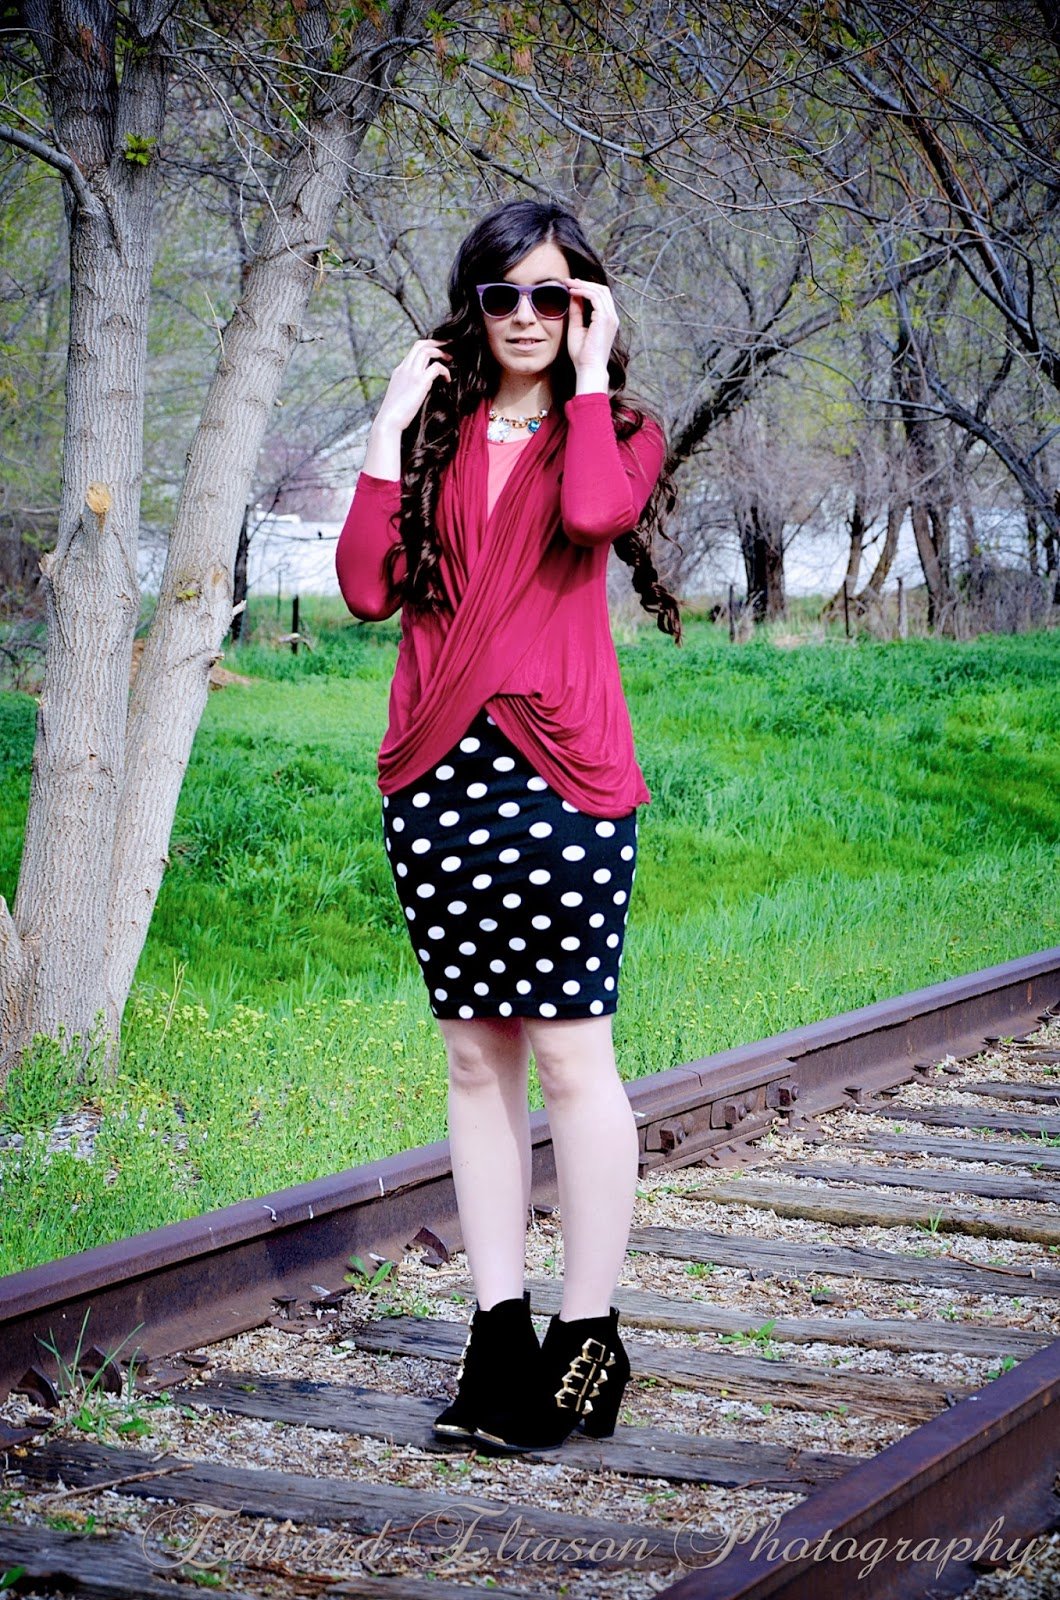 little nook boutique, little nook boutique tops, draped cardigan, burgundy cardigan, polka dot skirt outfit, polka dots, polka dot skirt, ankle booties, ankle boots, deb shops,